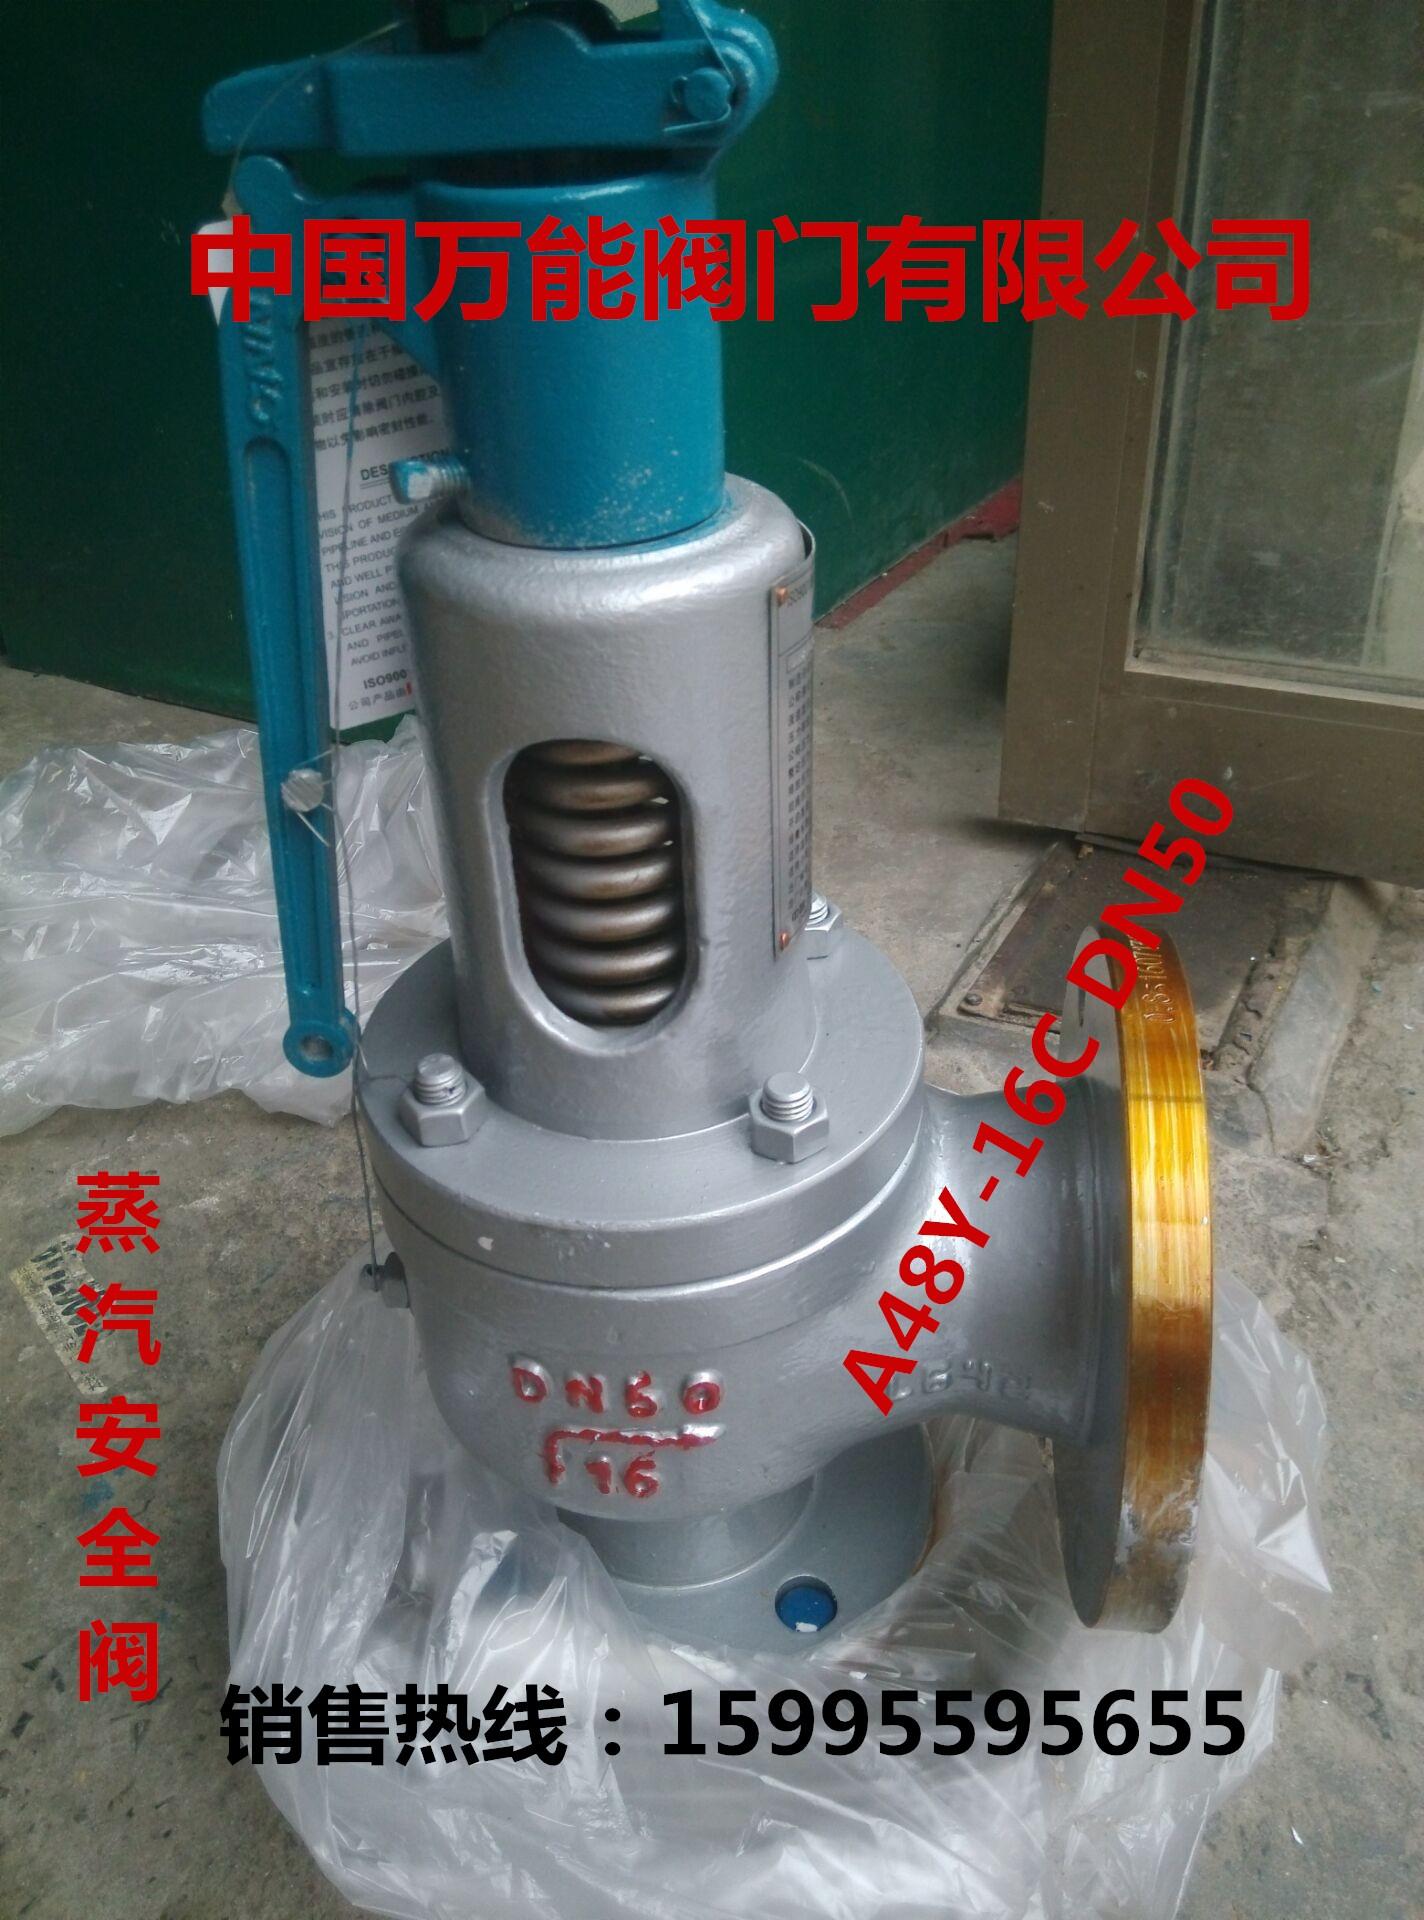 China universal valve spring safety valve steam safety valve flange A48Y-16CDN125